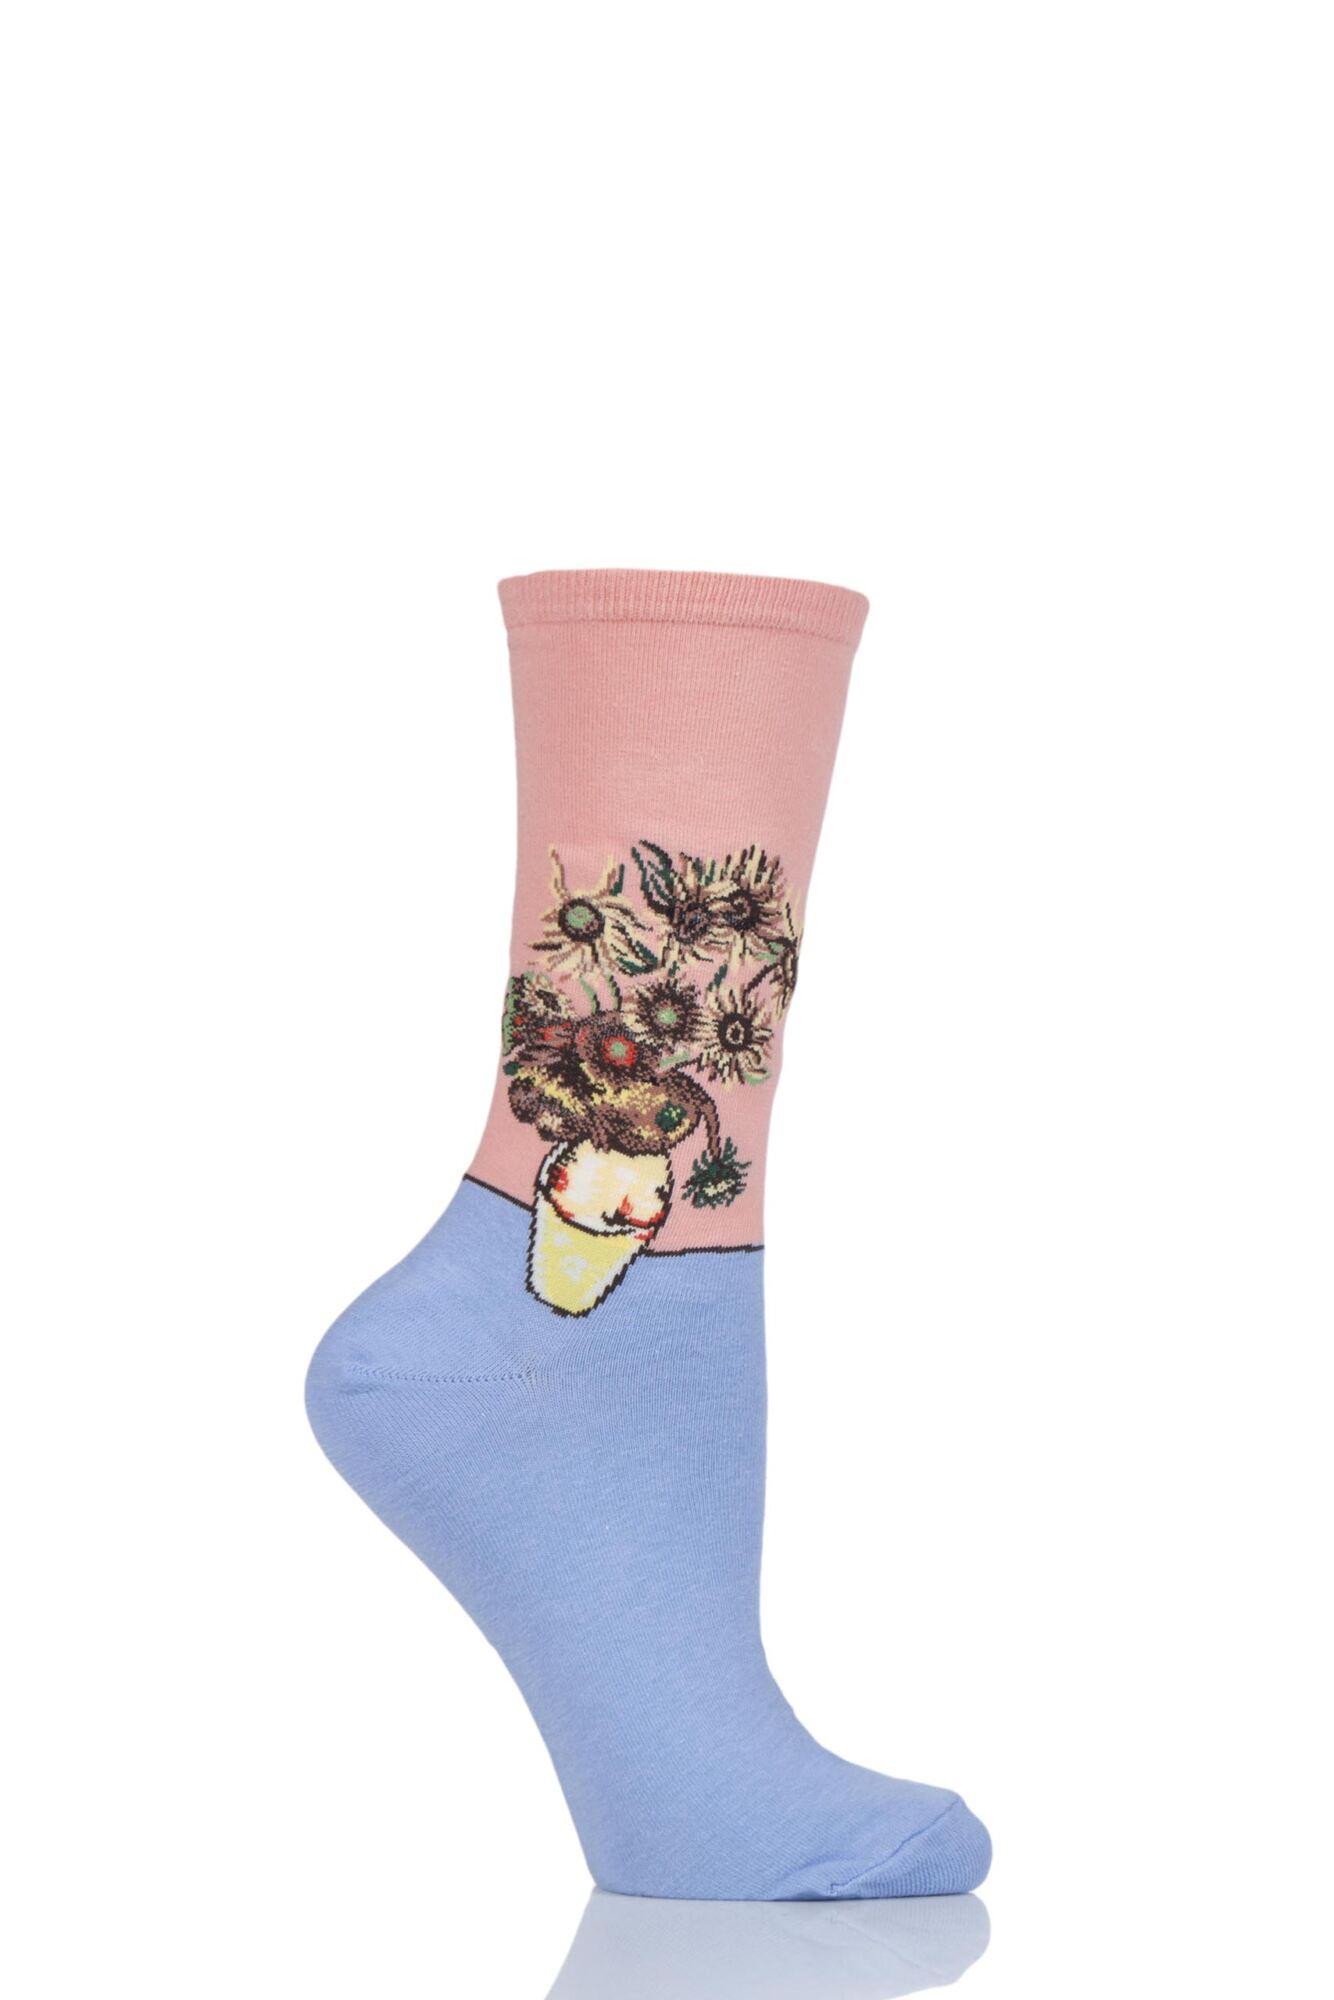 1 Pair HotSox Artist Collection Sunflowers Cotton Socks Ladies - Hot Sox